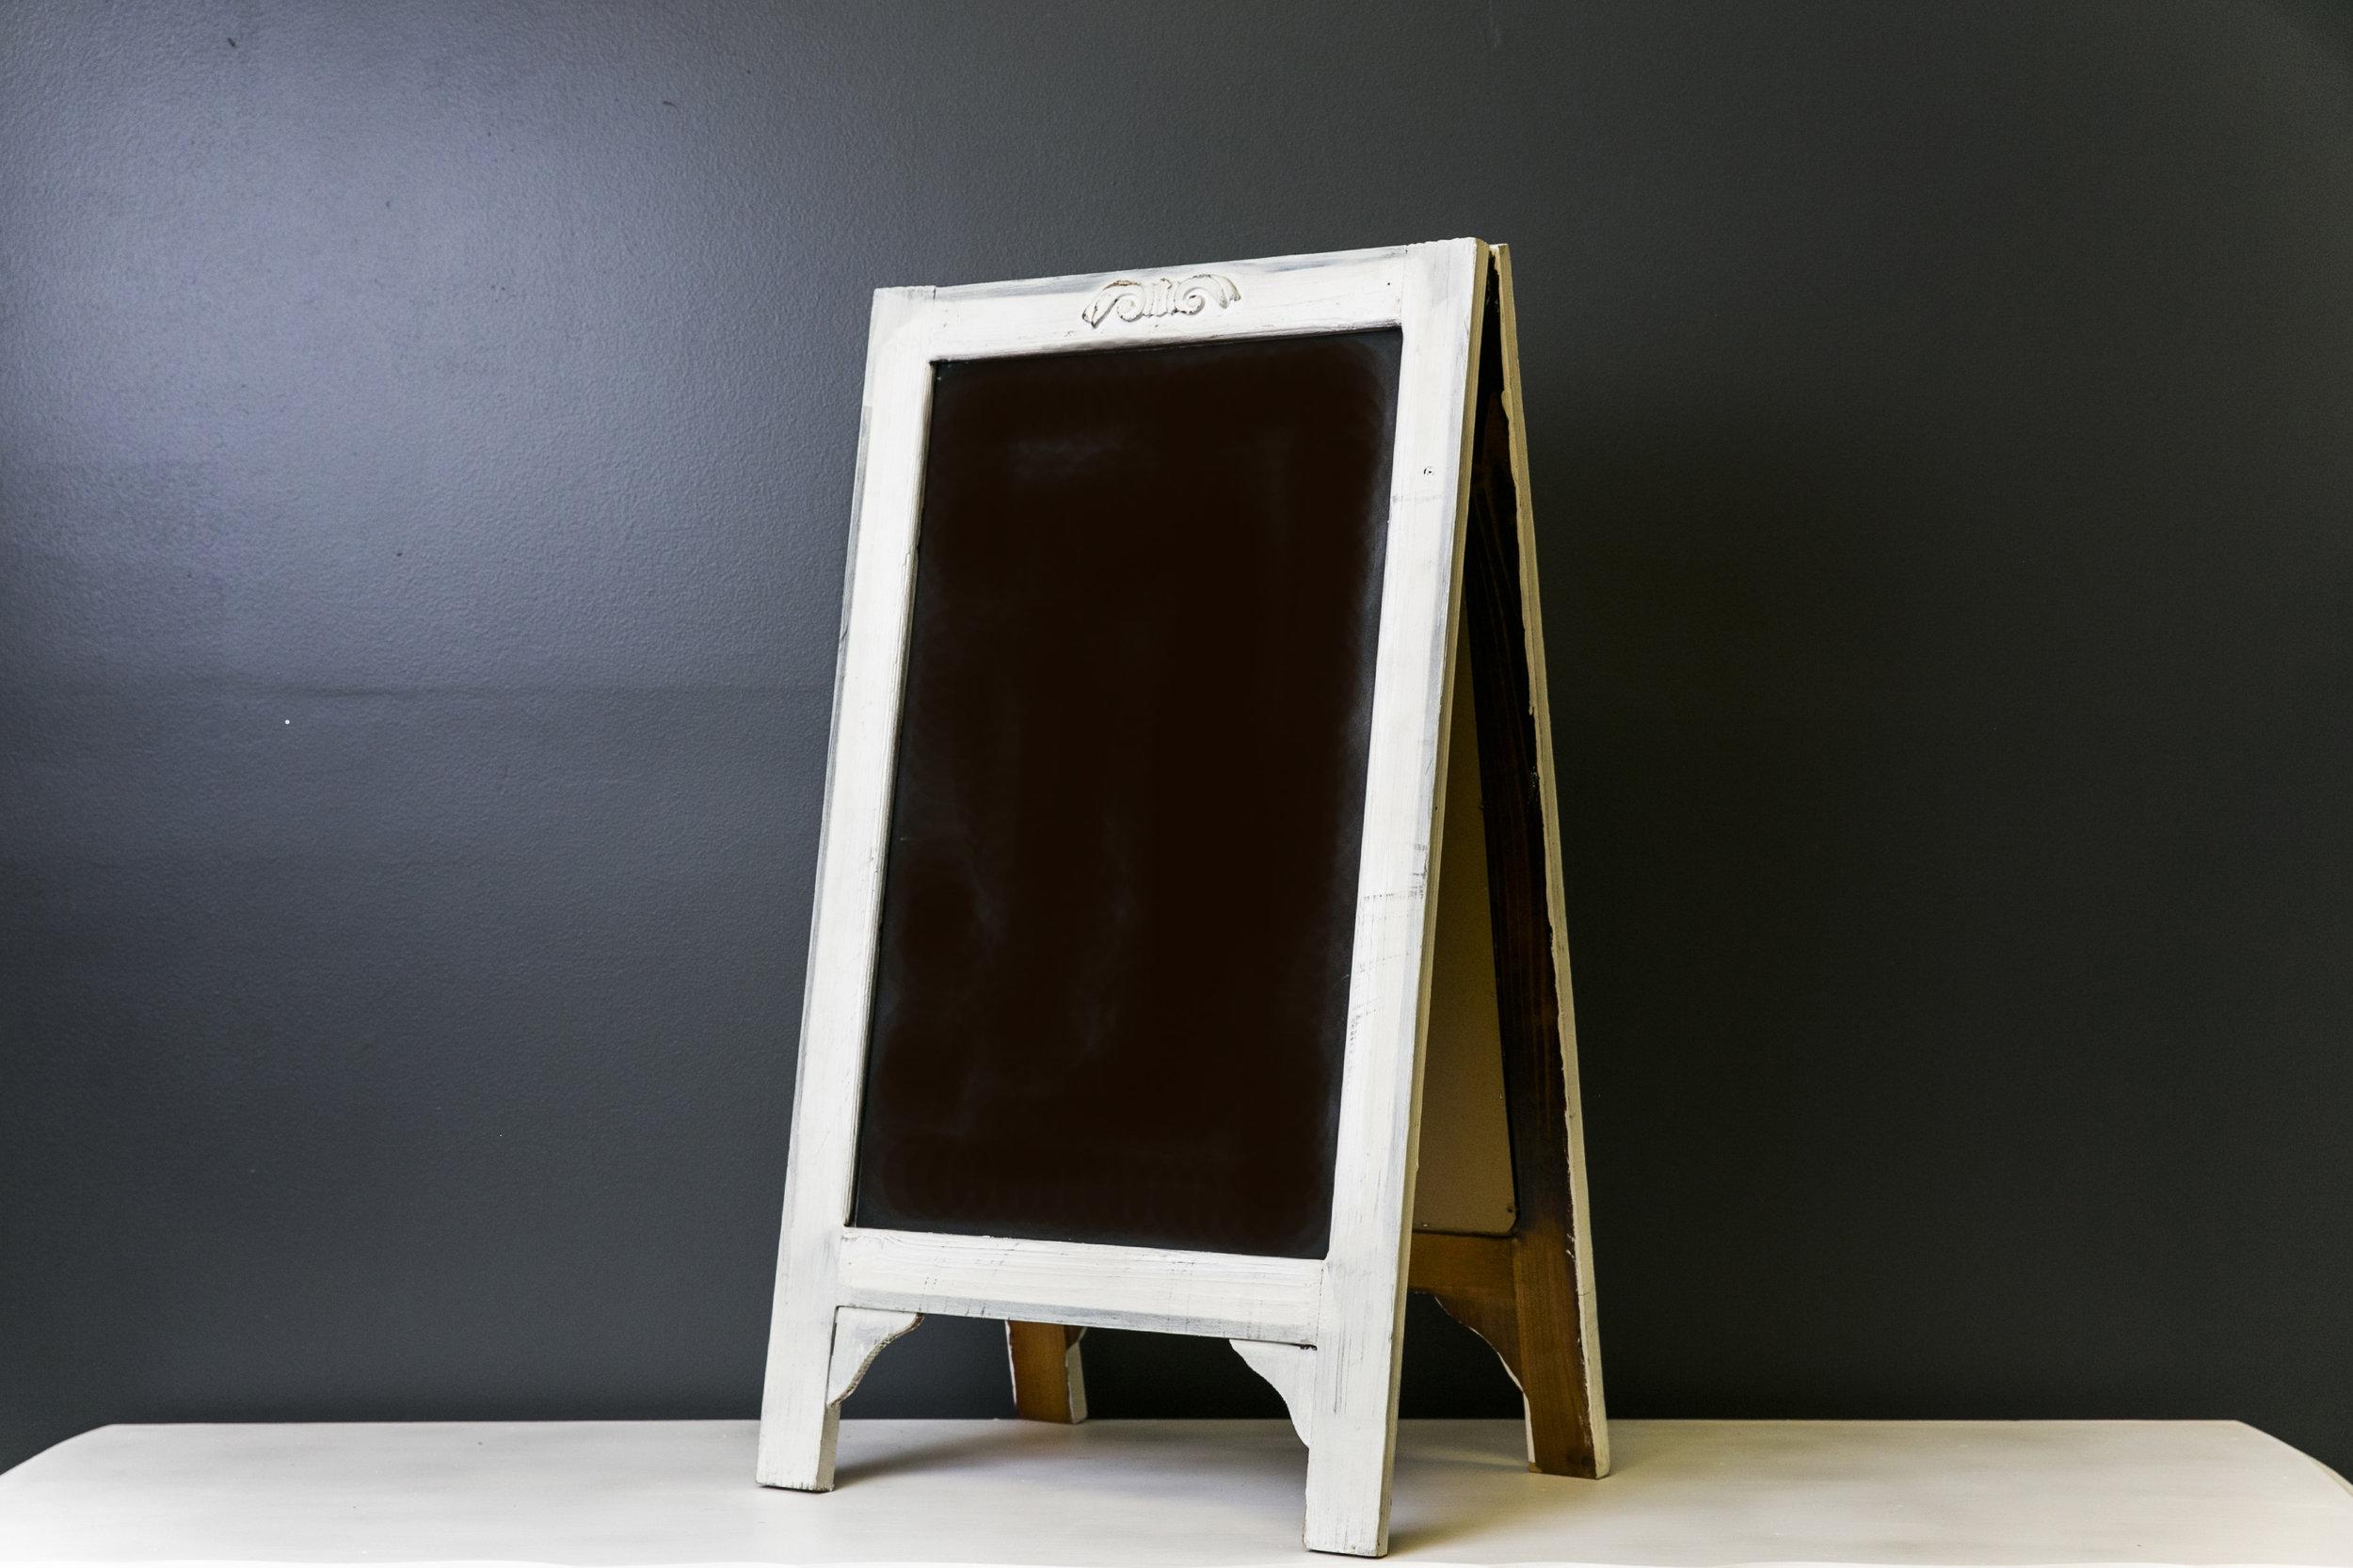 Bennet A-Frame Chalkboard (White) 25 x 17